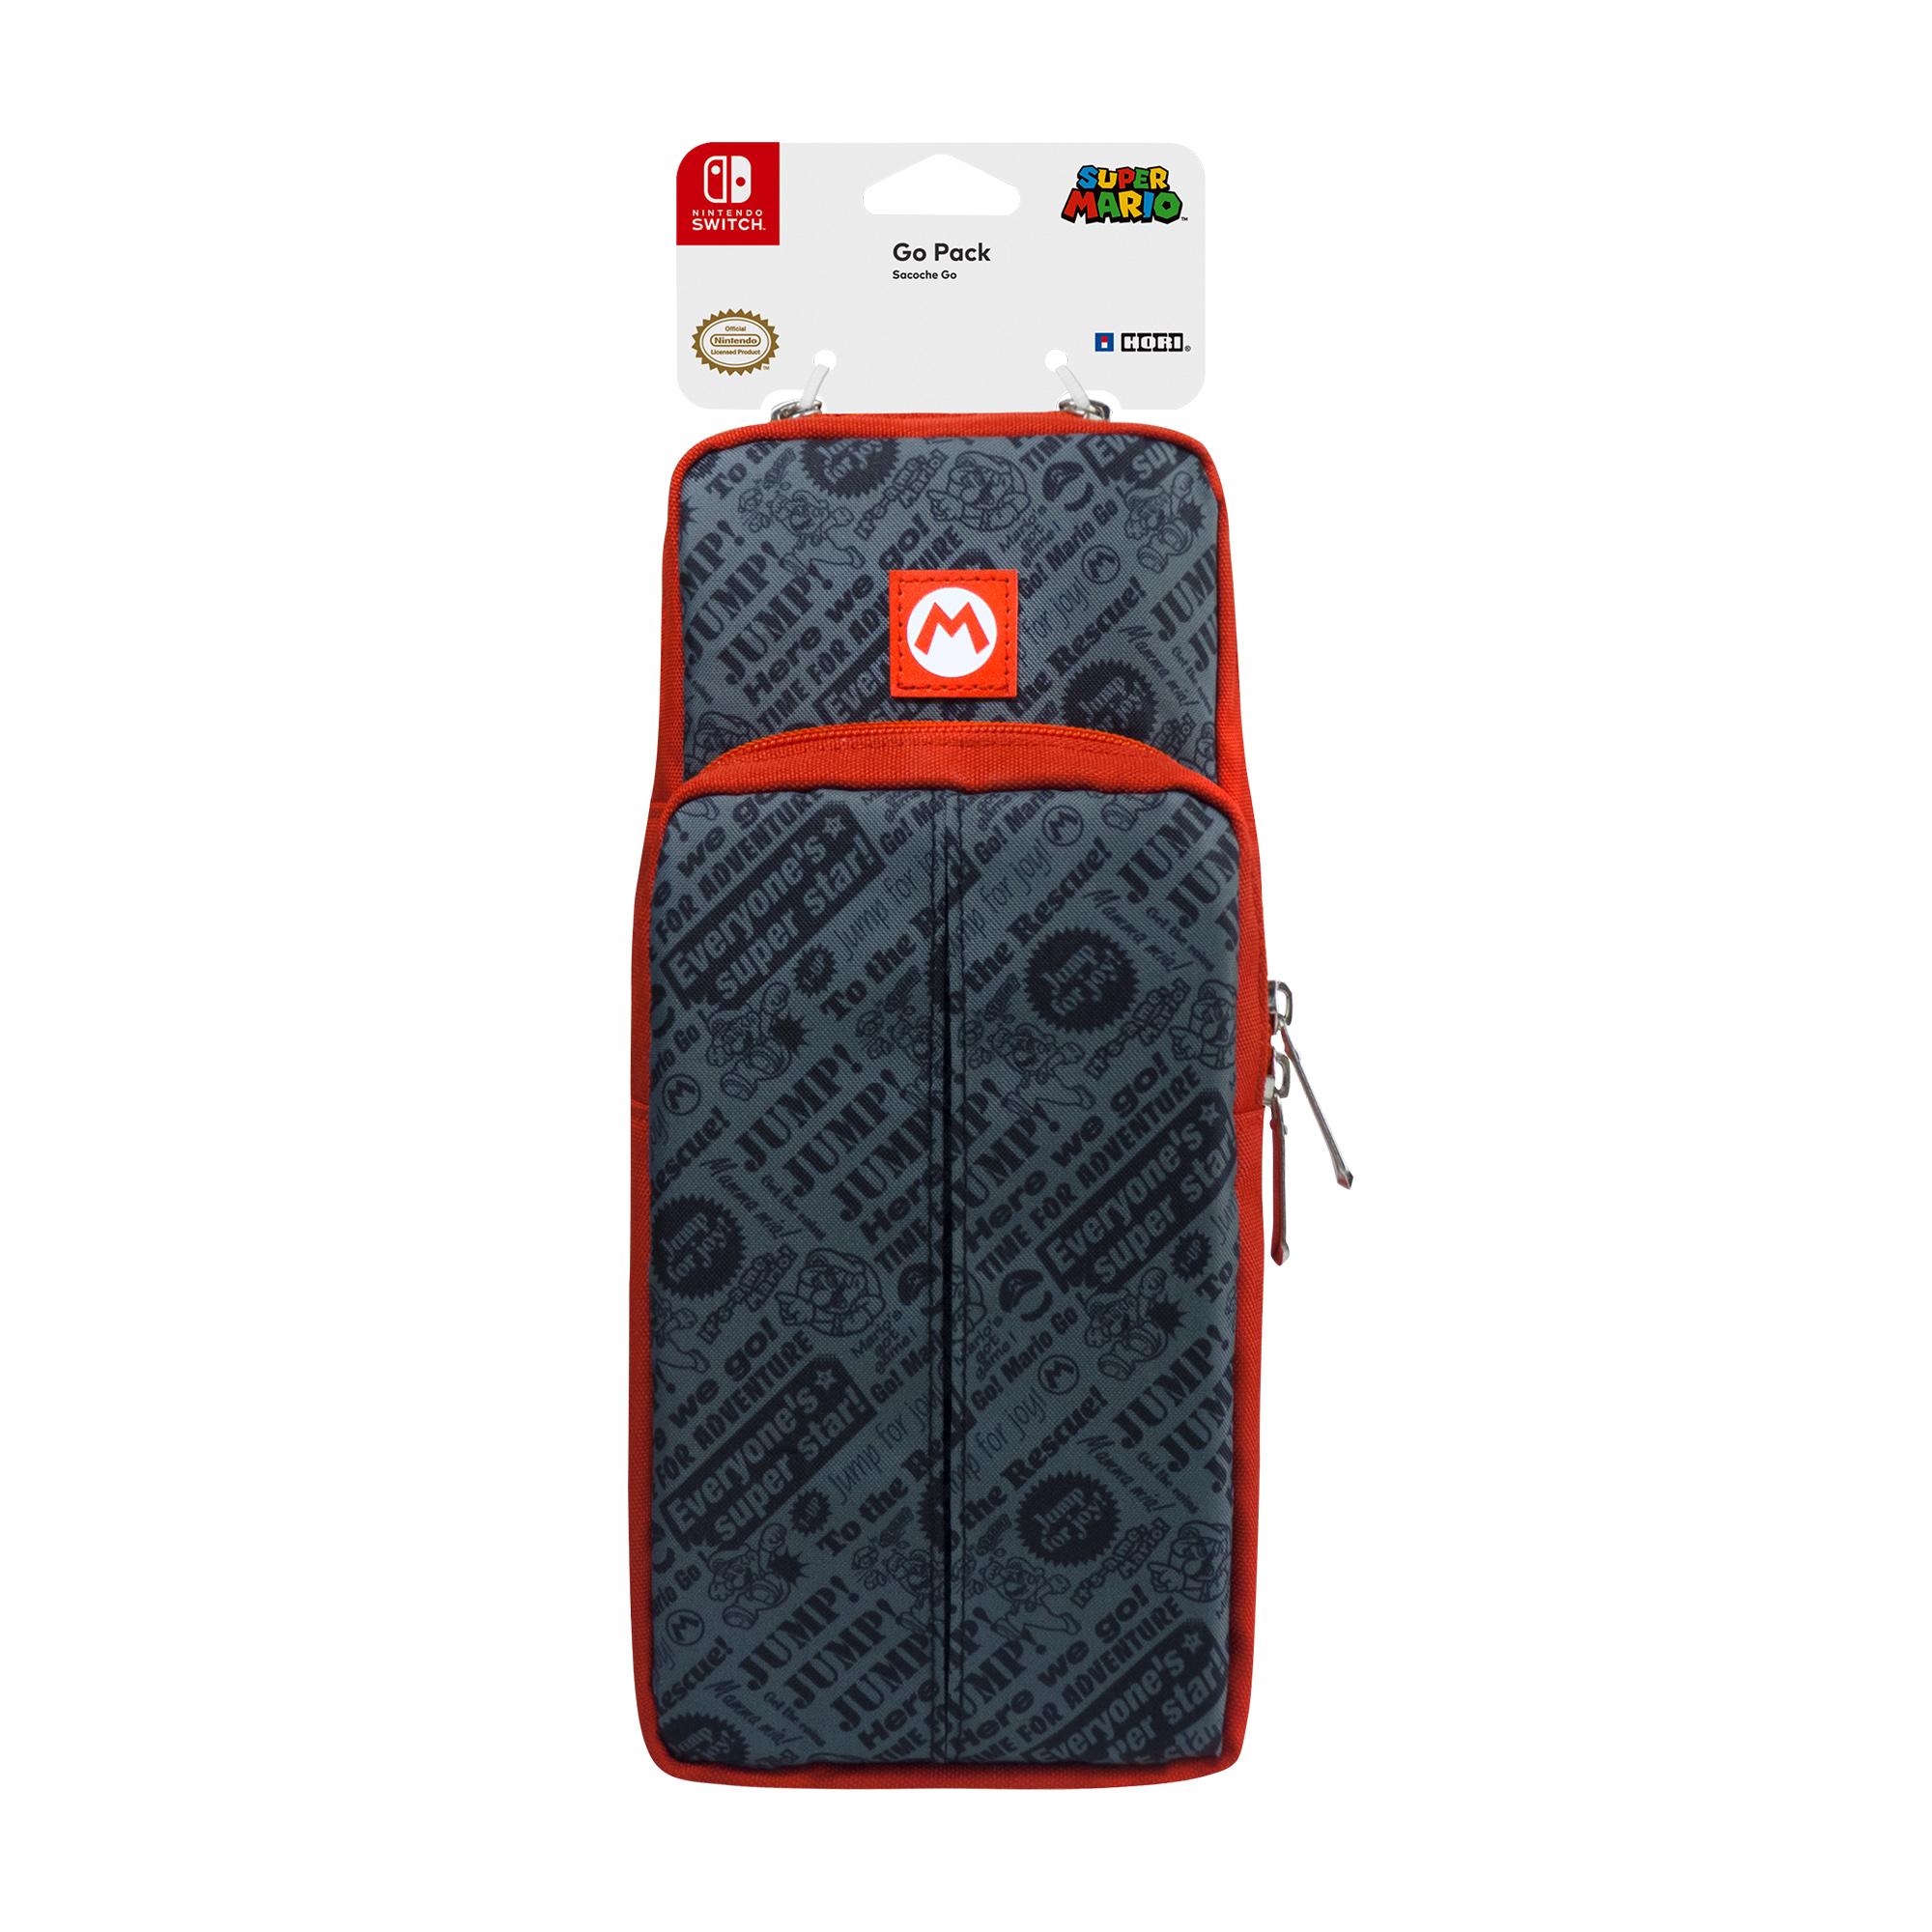 3477b5e405b1 Nintendo Switch Сумка Hori (SUPER MARIO) для акссесуаров и консоли Switch ( NSW-